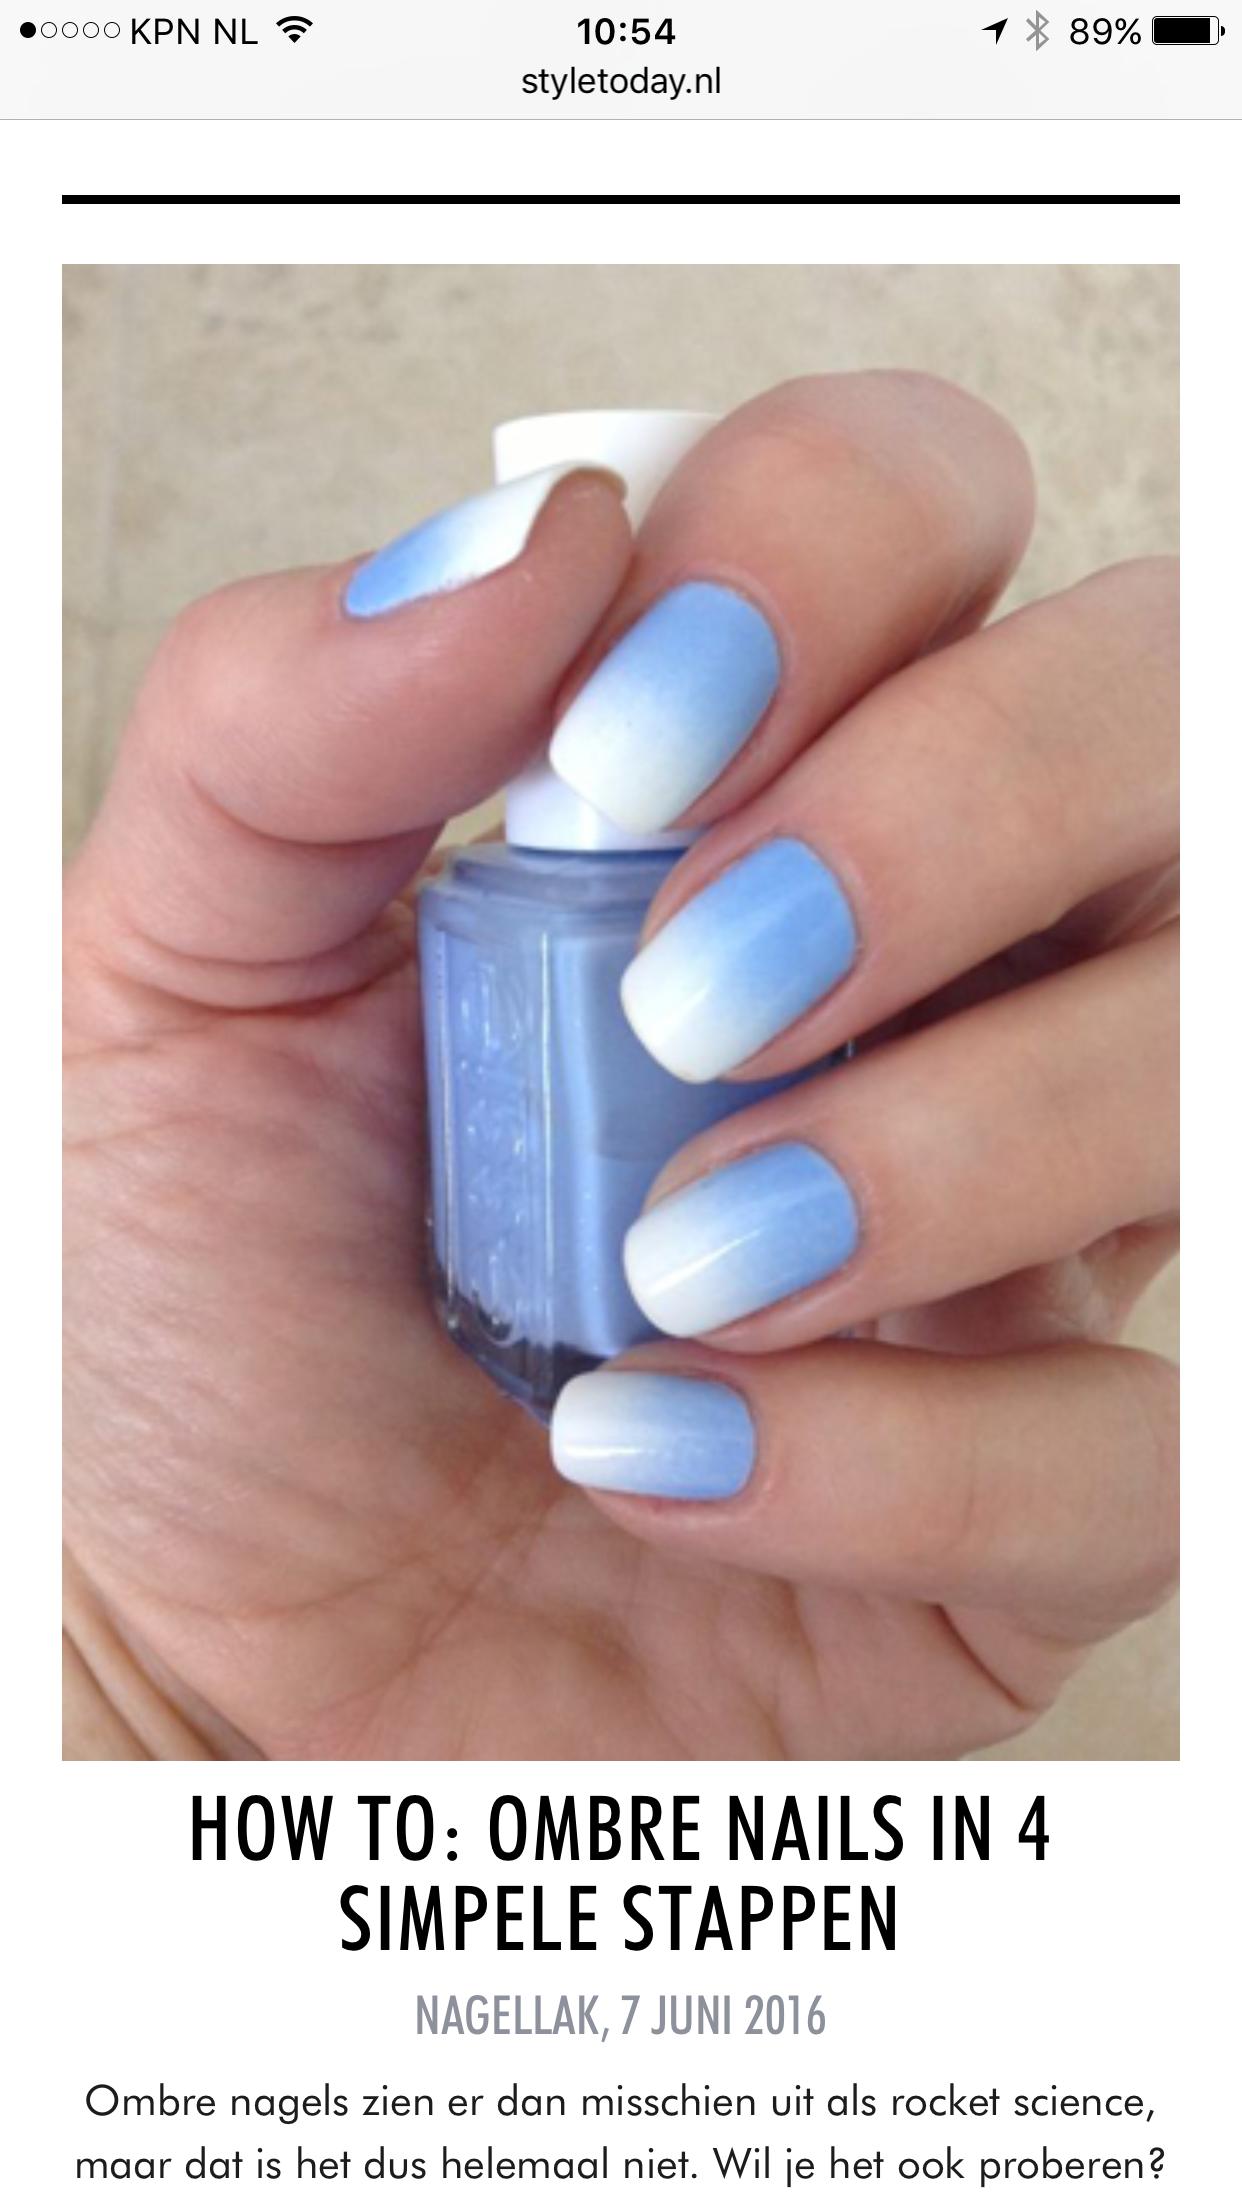 pincindy kuklis on nails | pinterest | manicure, nail nail and